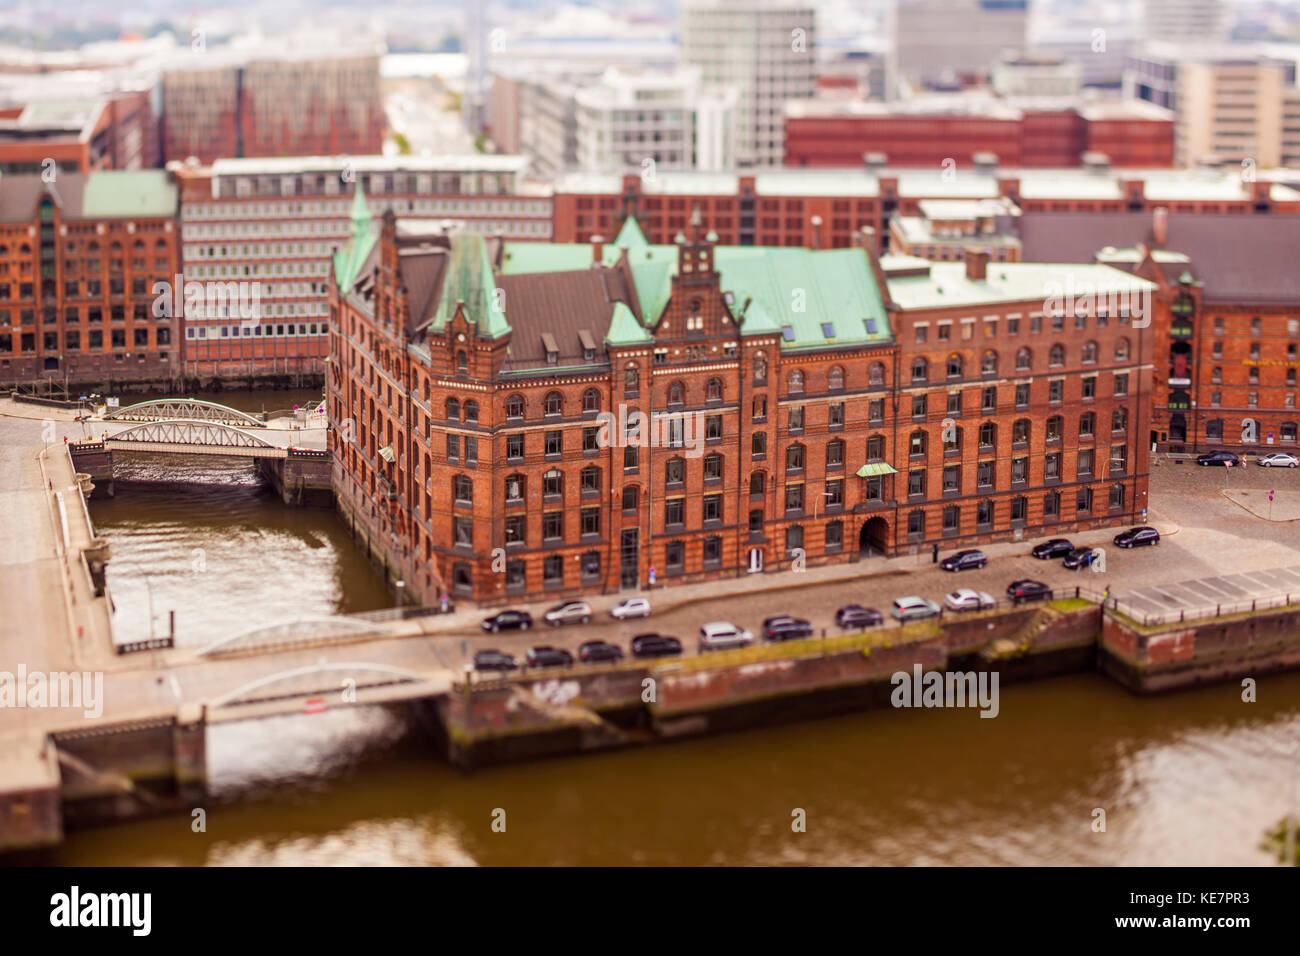 Historic warehouse at Speicherstadt Hamburg, Tilt-Shift Photography - Stock Image